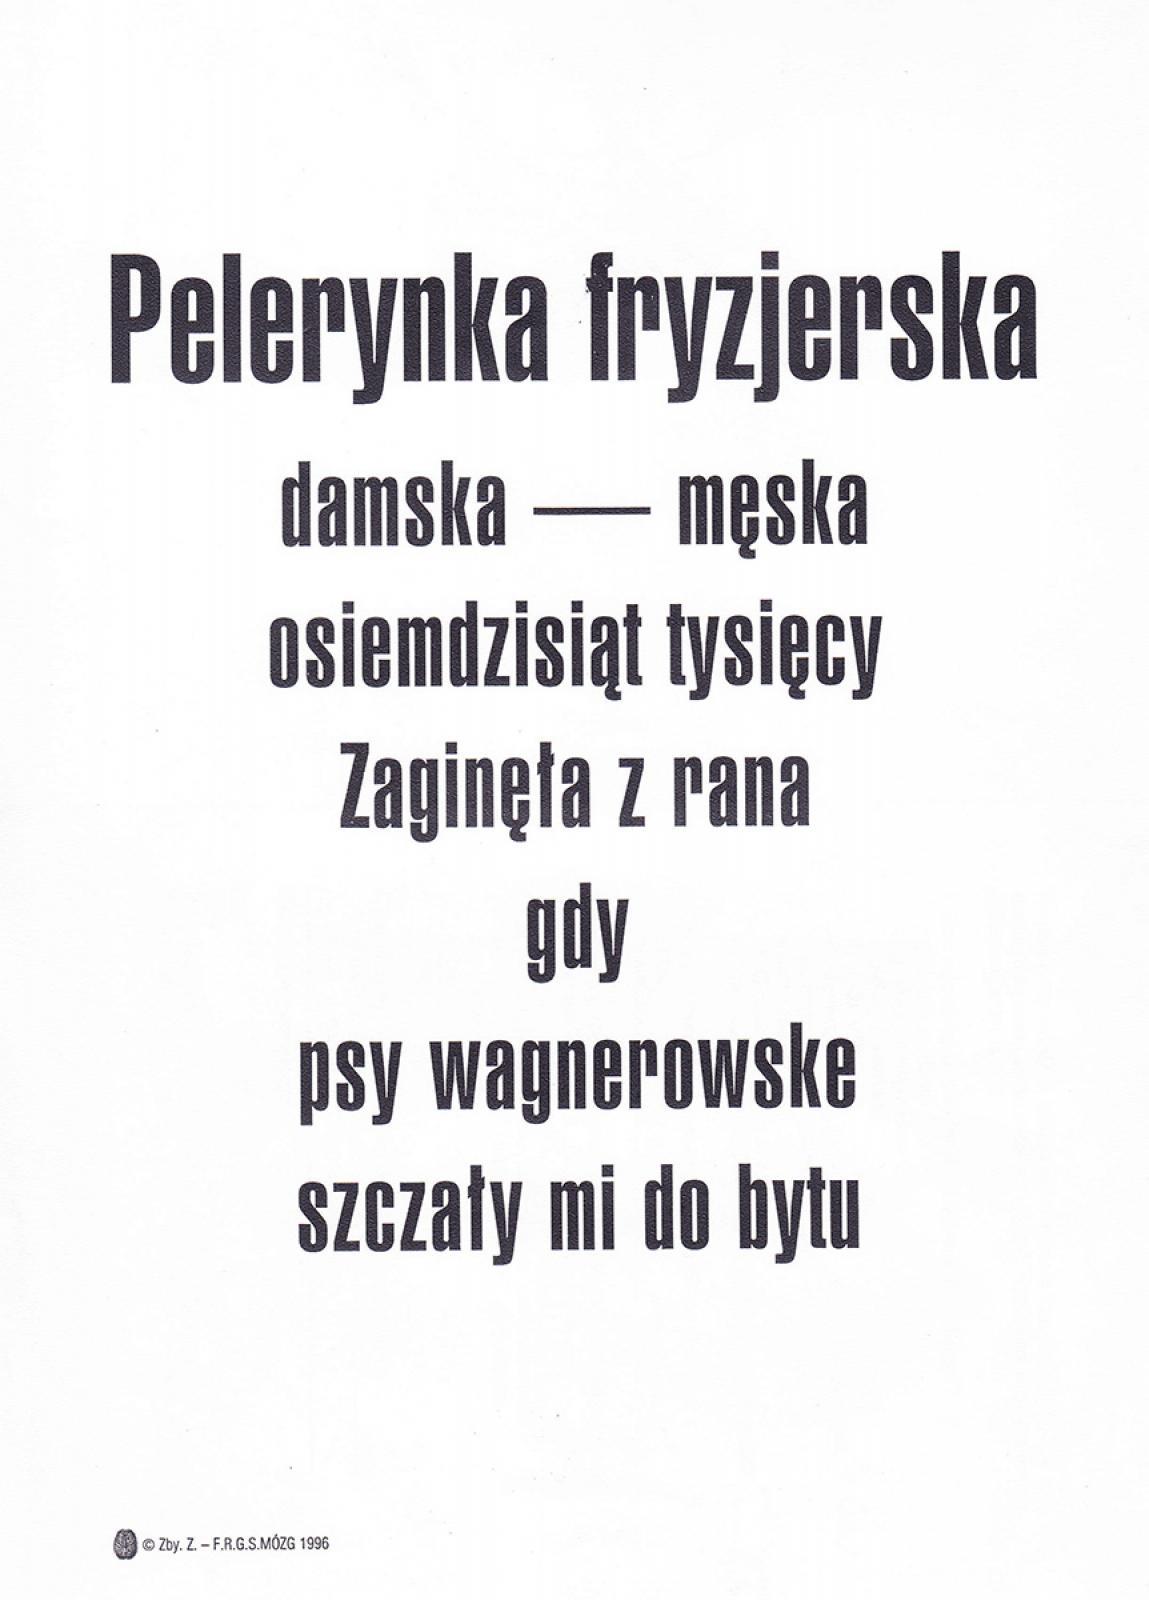 Pelerynka